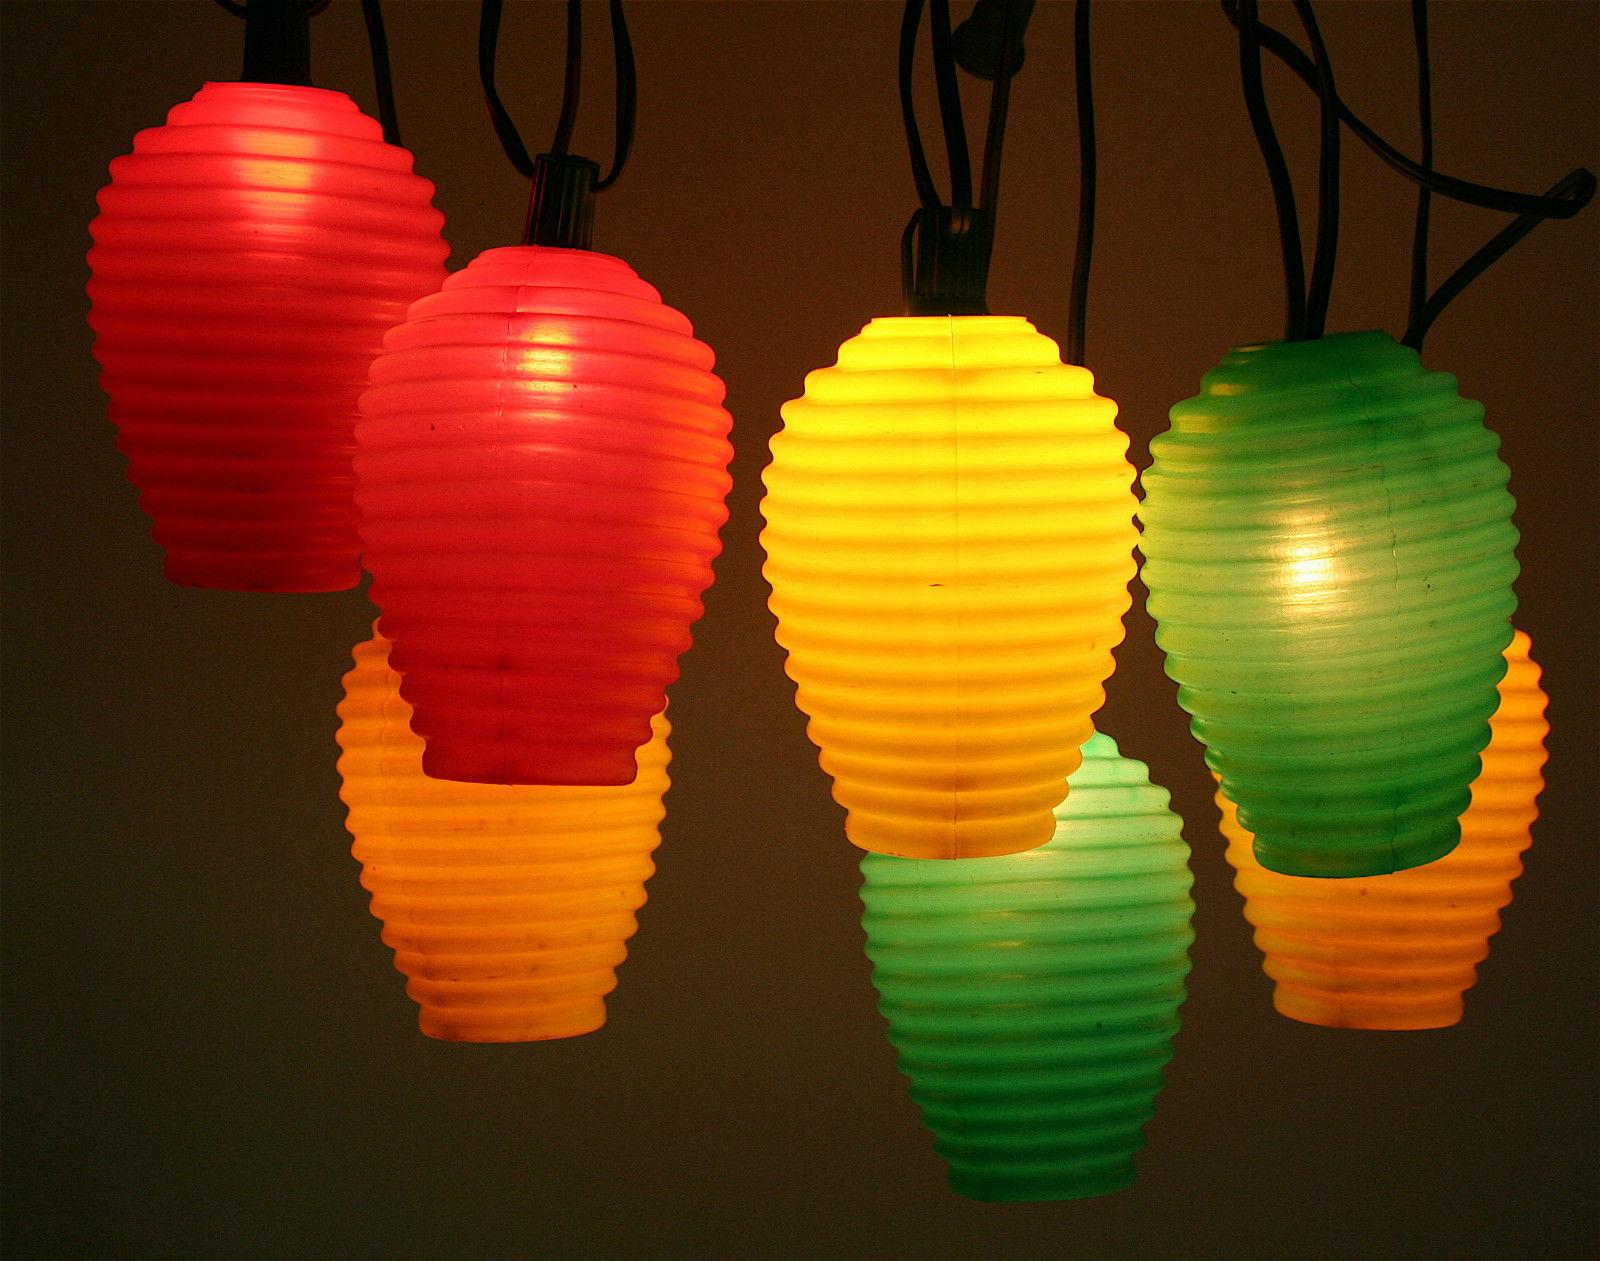 camper outdoor lights photo - 8